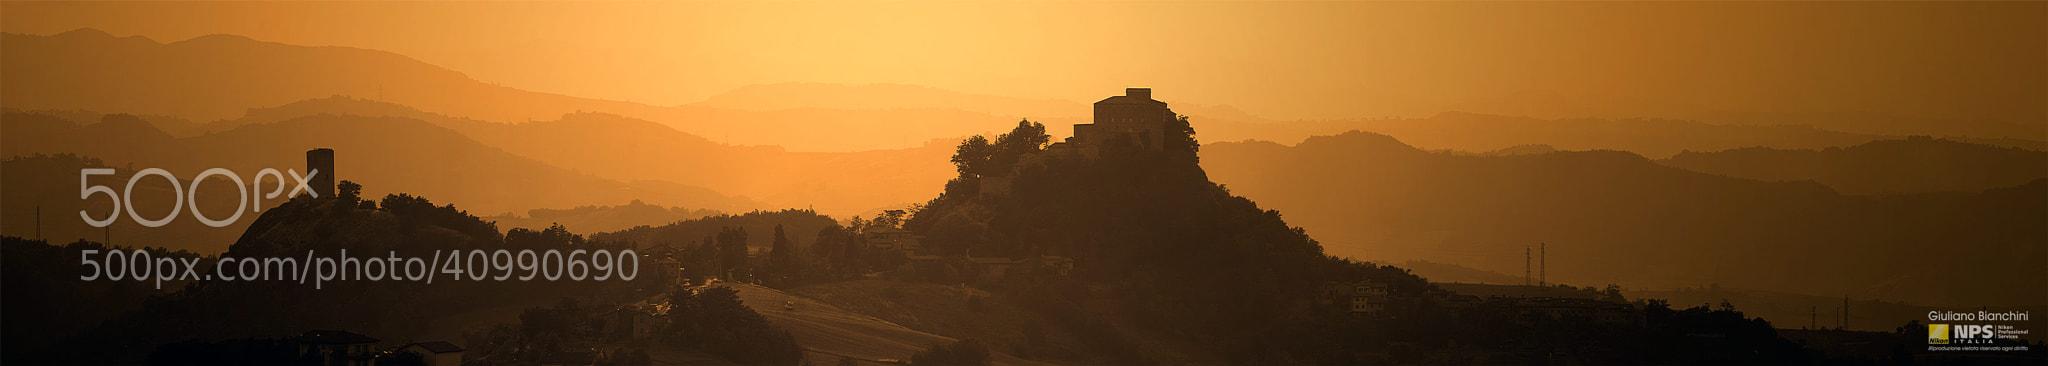 Photograph Rossena - Nikon D4 by Giuliano Bianchini on 500px